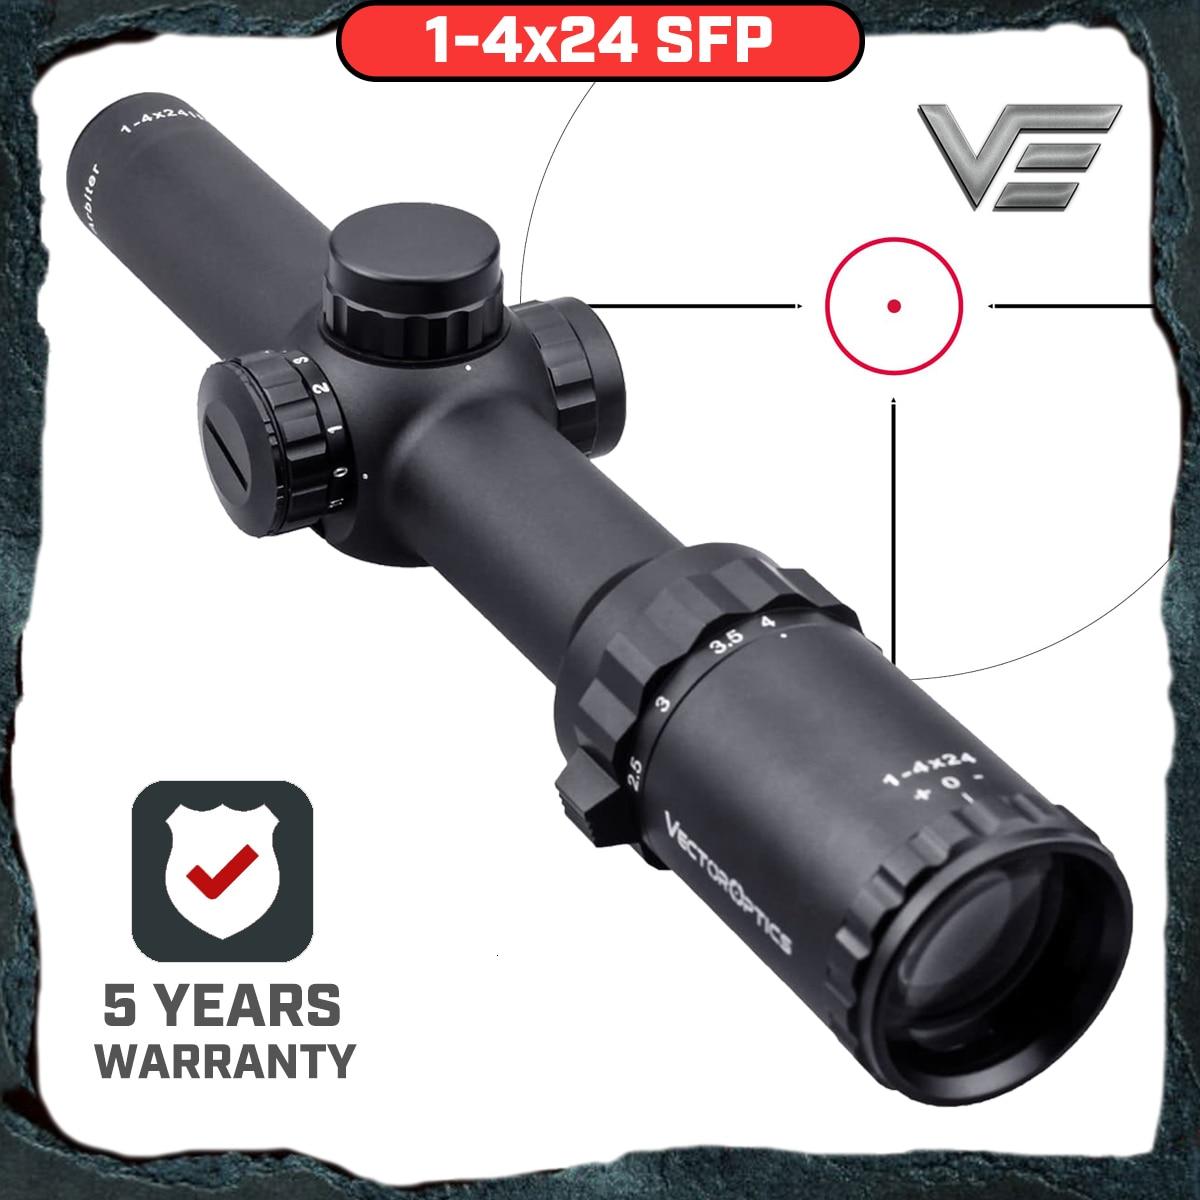 Vector Optics Arbiter 1 4x24 Hunting Riflescope Long Eye Relief Illuminated Red Telescopic Sight Scope fit 30 06 308 AR15 M4|vector optics arbiter|long eye relief|eye relief - title=